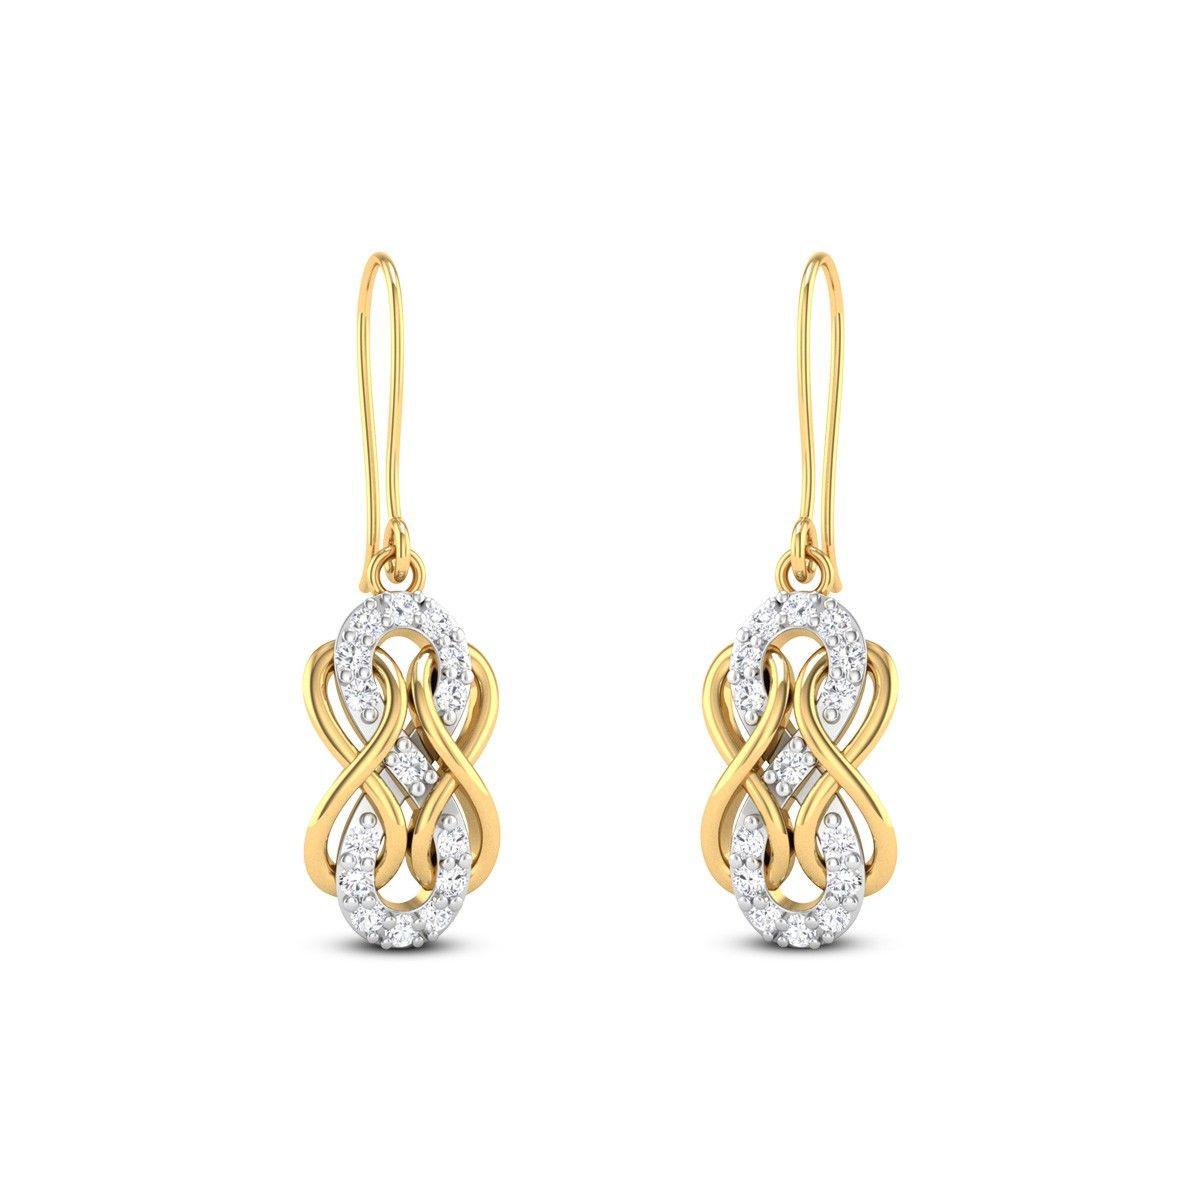 Cornaro Diamond Studded Gold Earrings